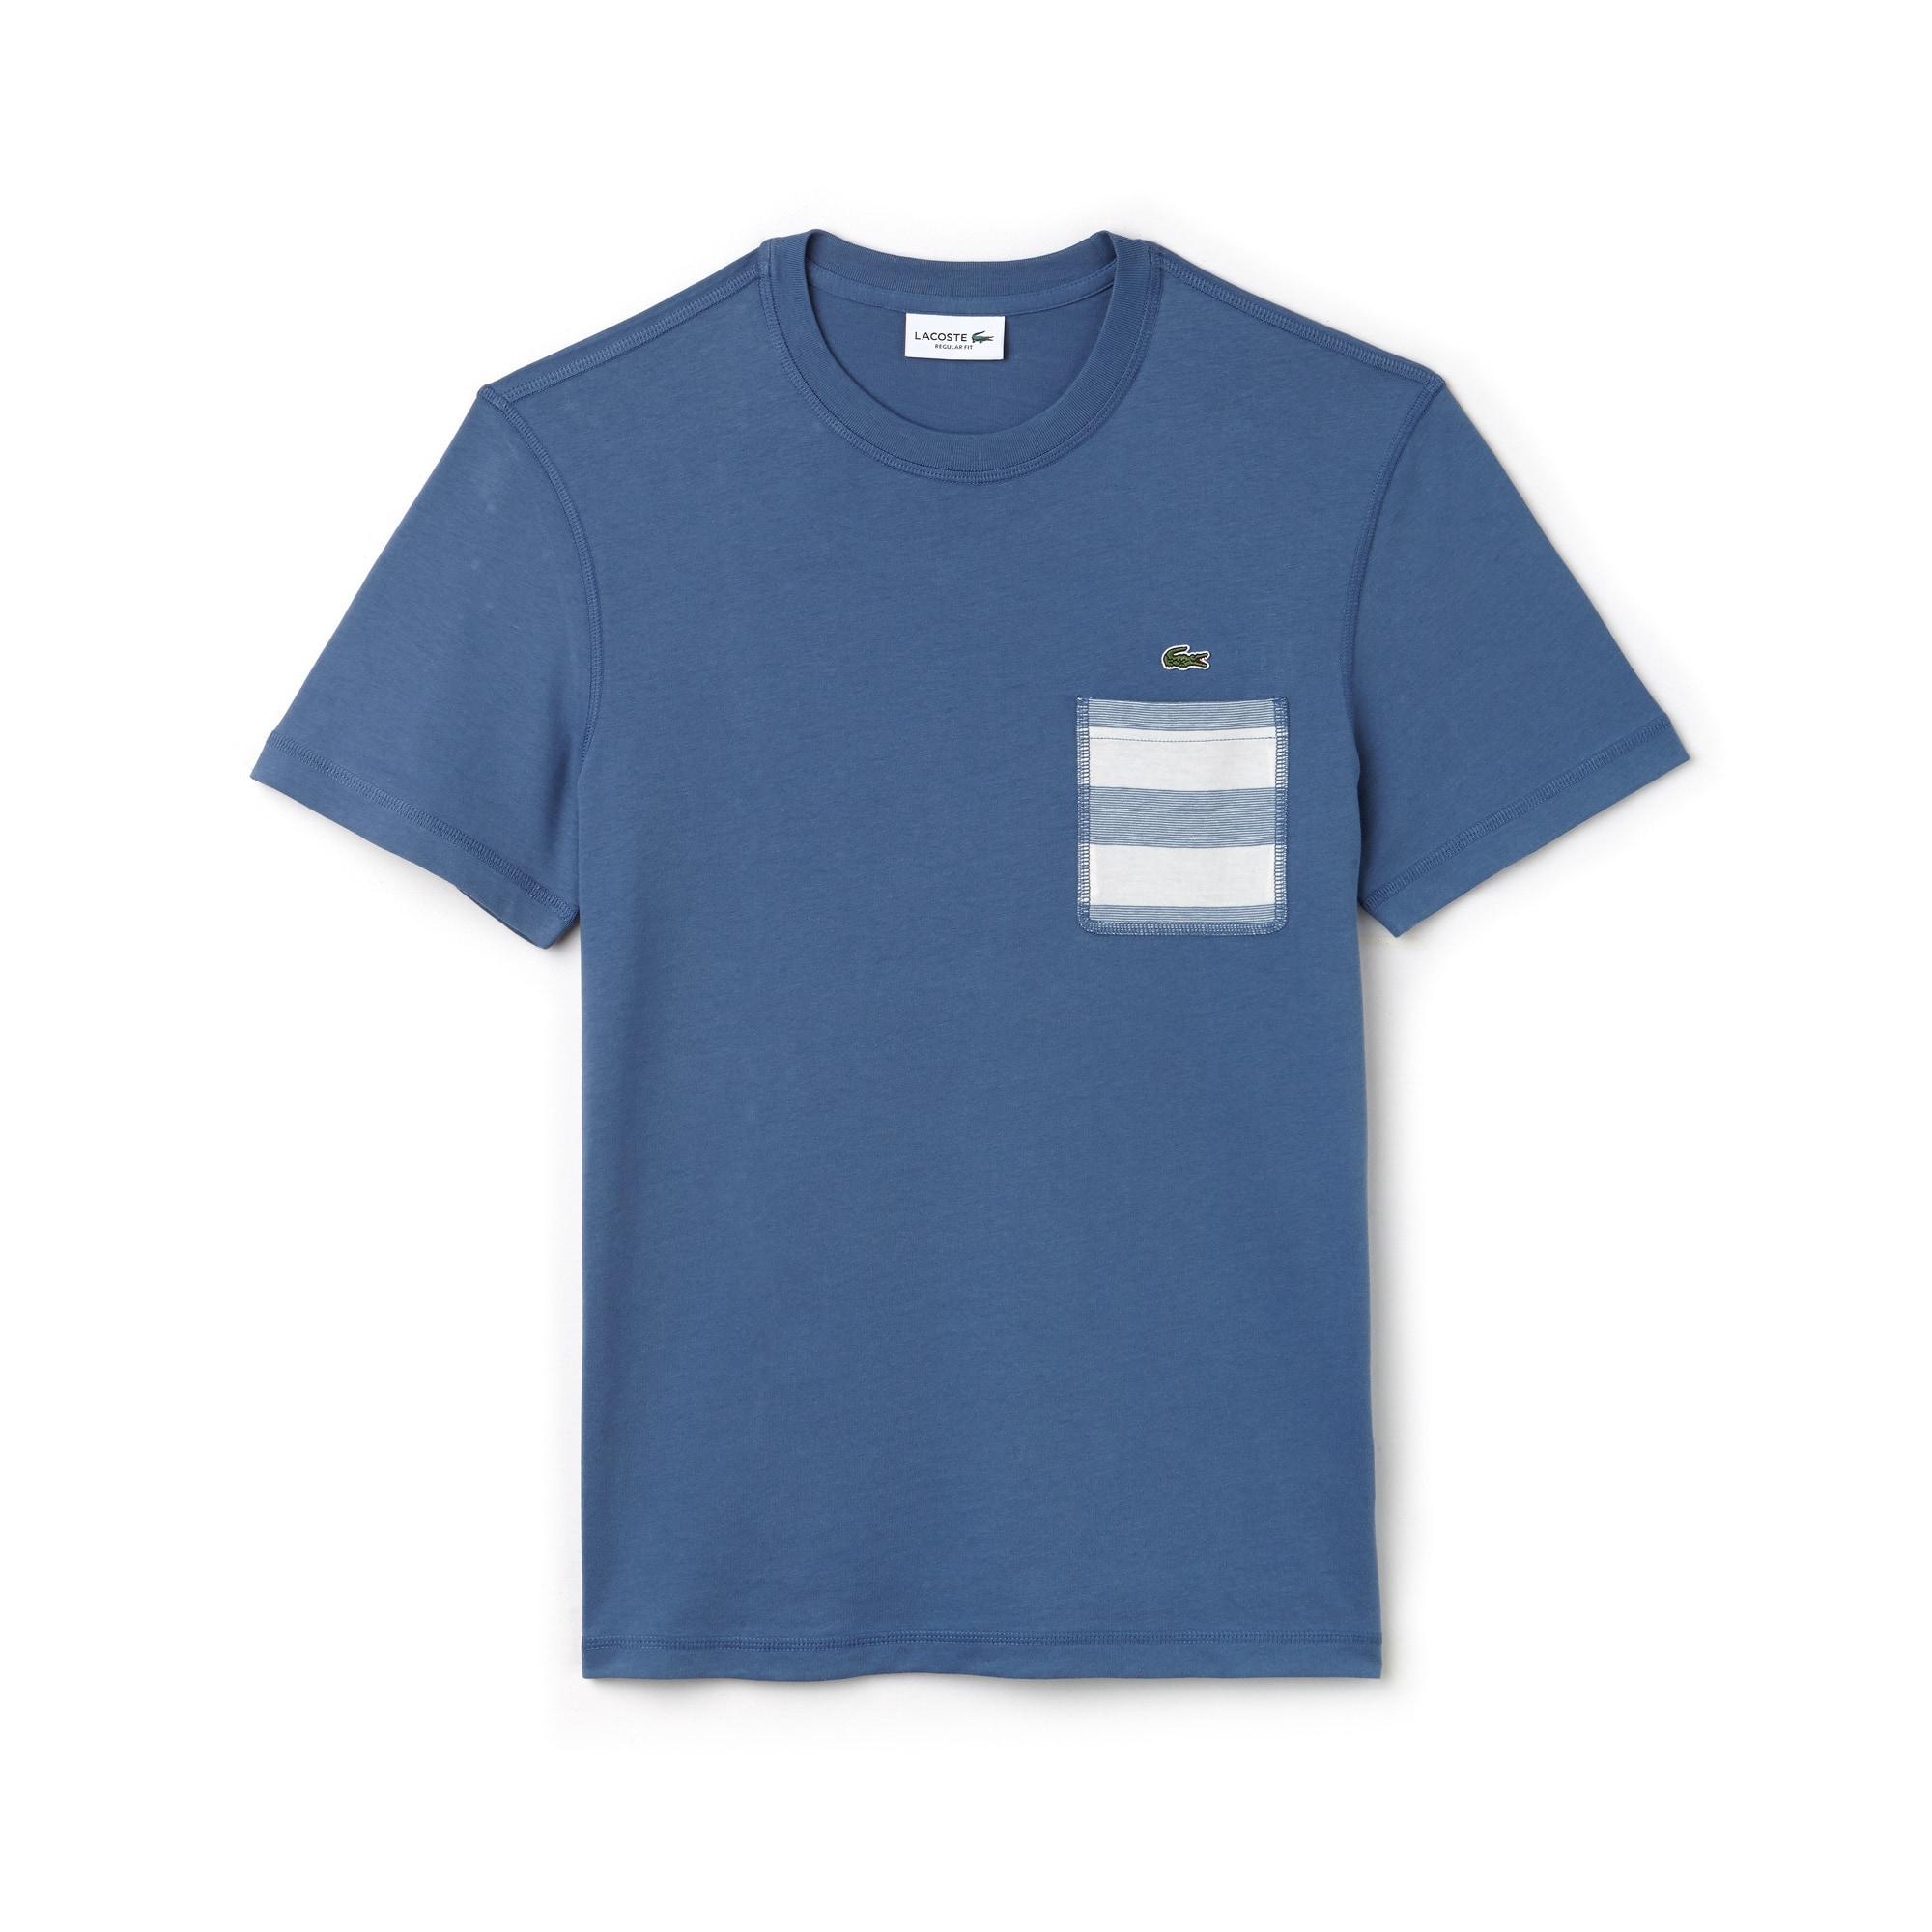 Camiseta con cuello redondo de punto jersey de algodón con bolsillo de rayas